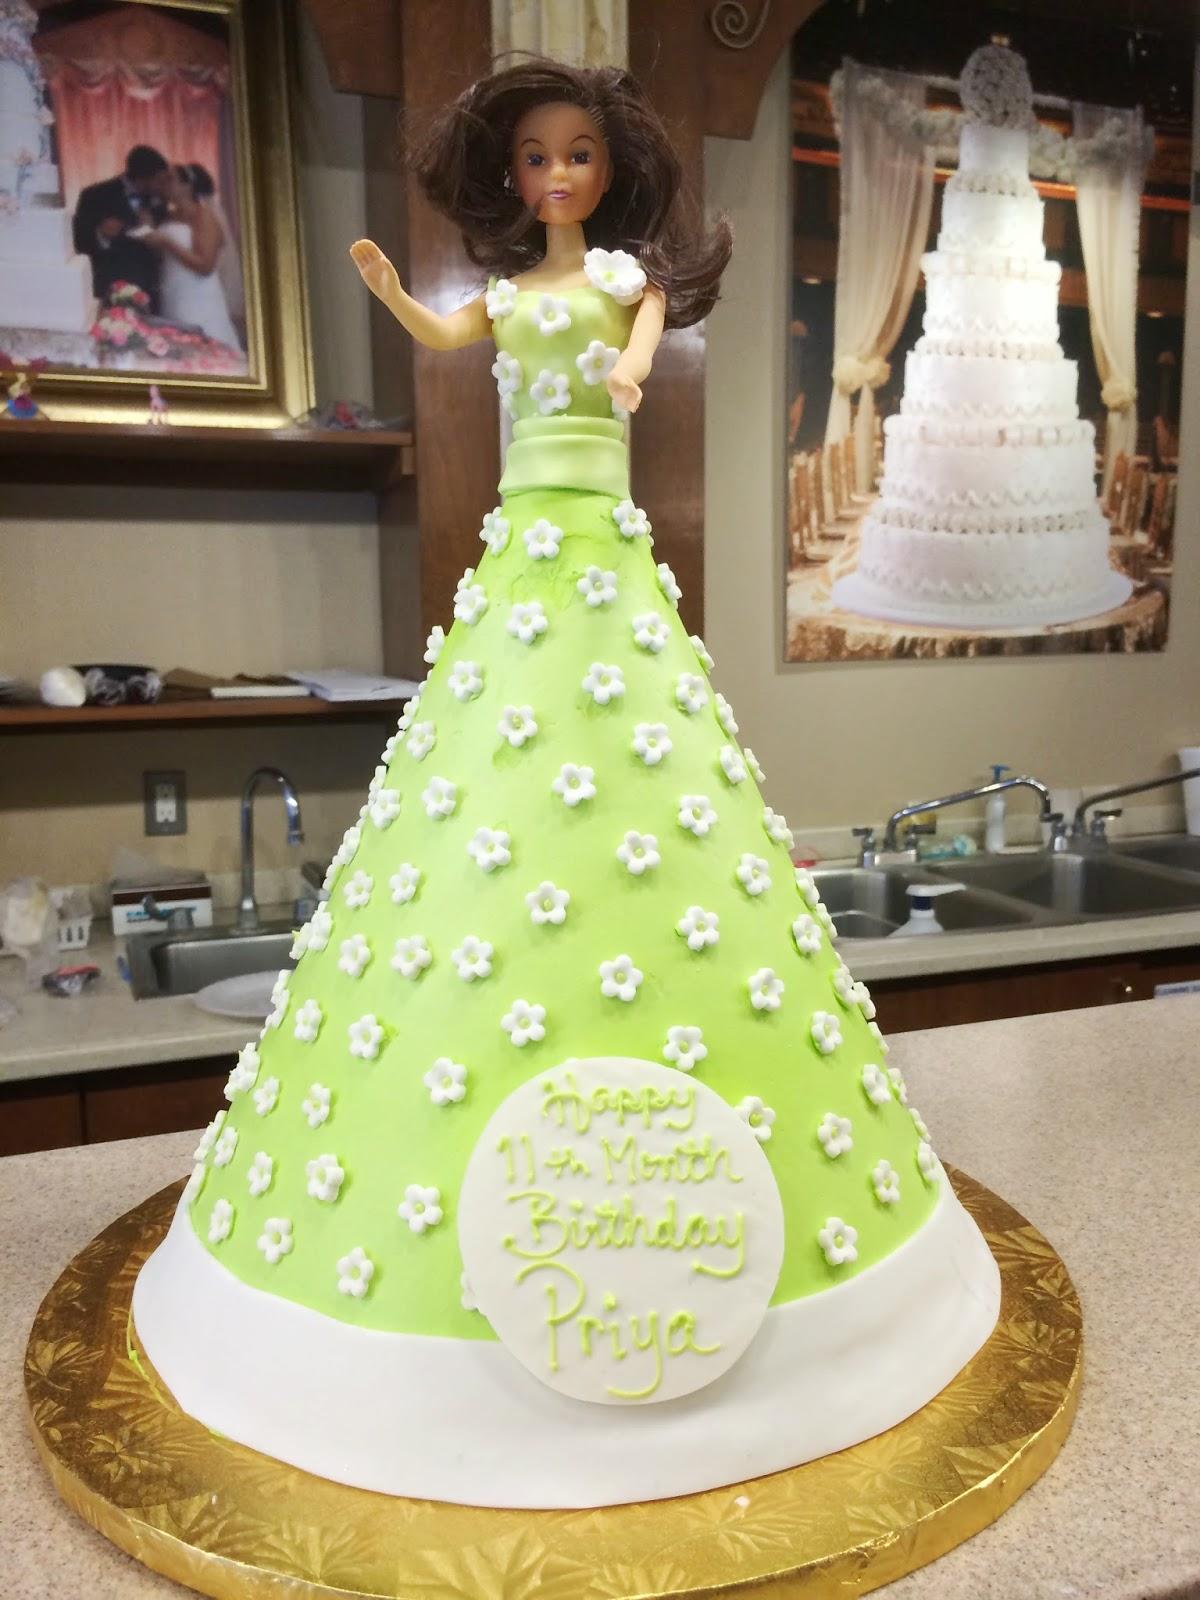 Cake Pic Priya : Vijay Madala, My Story: Priya s 11th Month Pictures